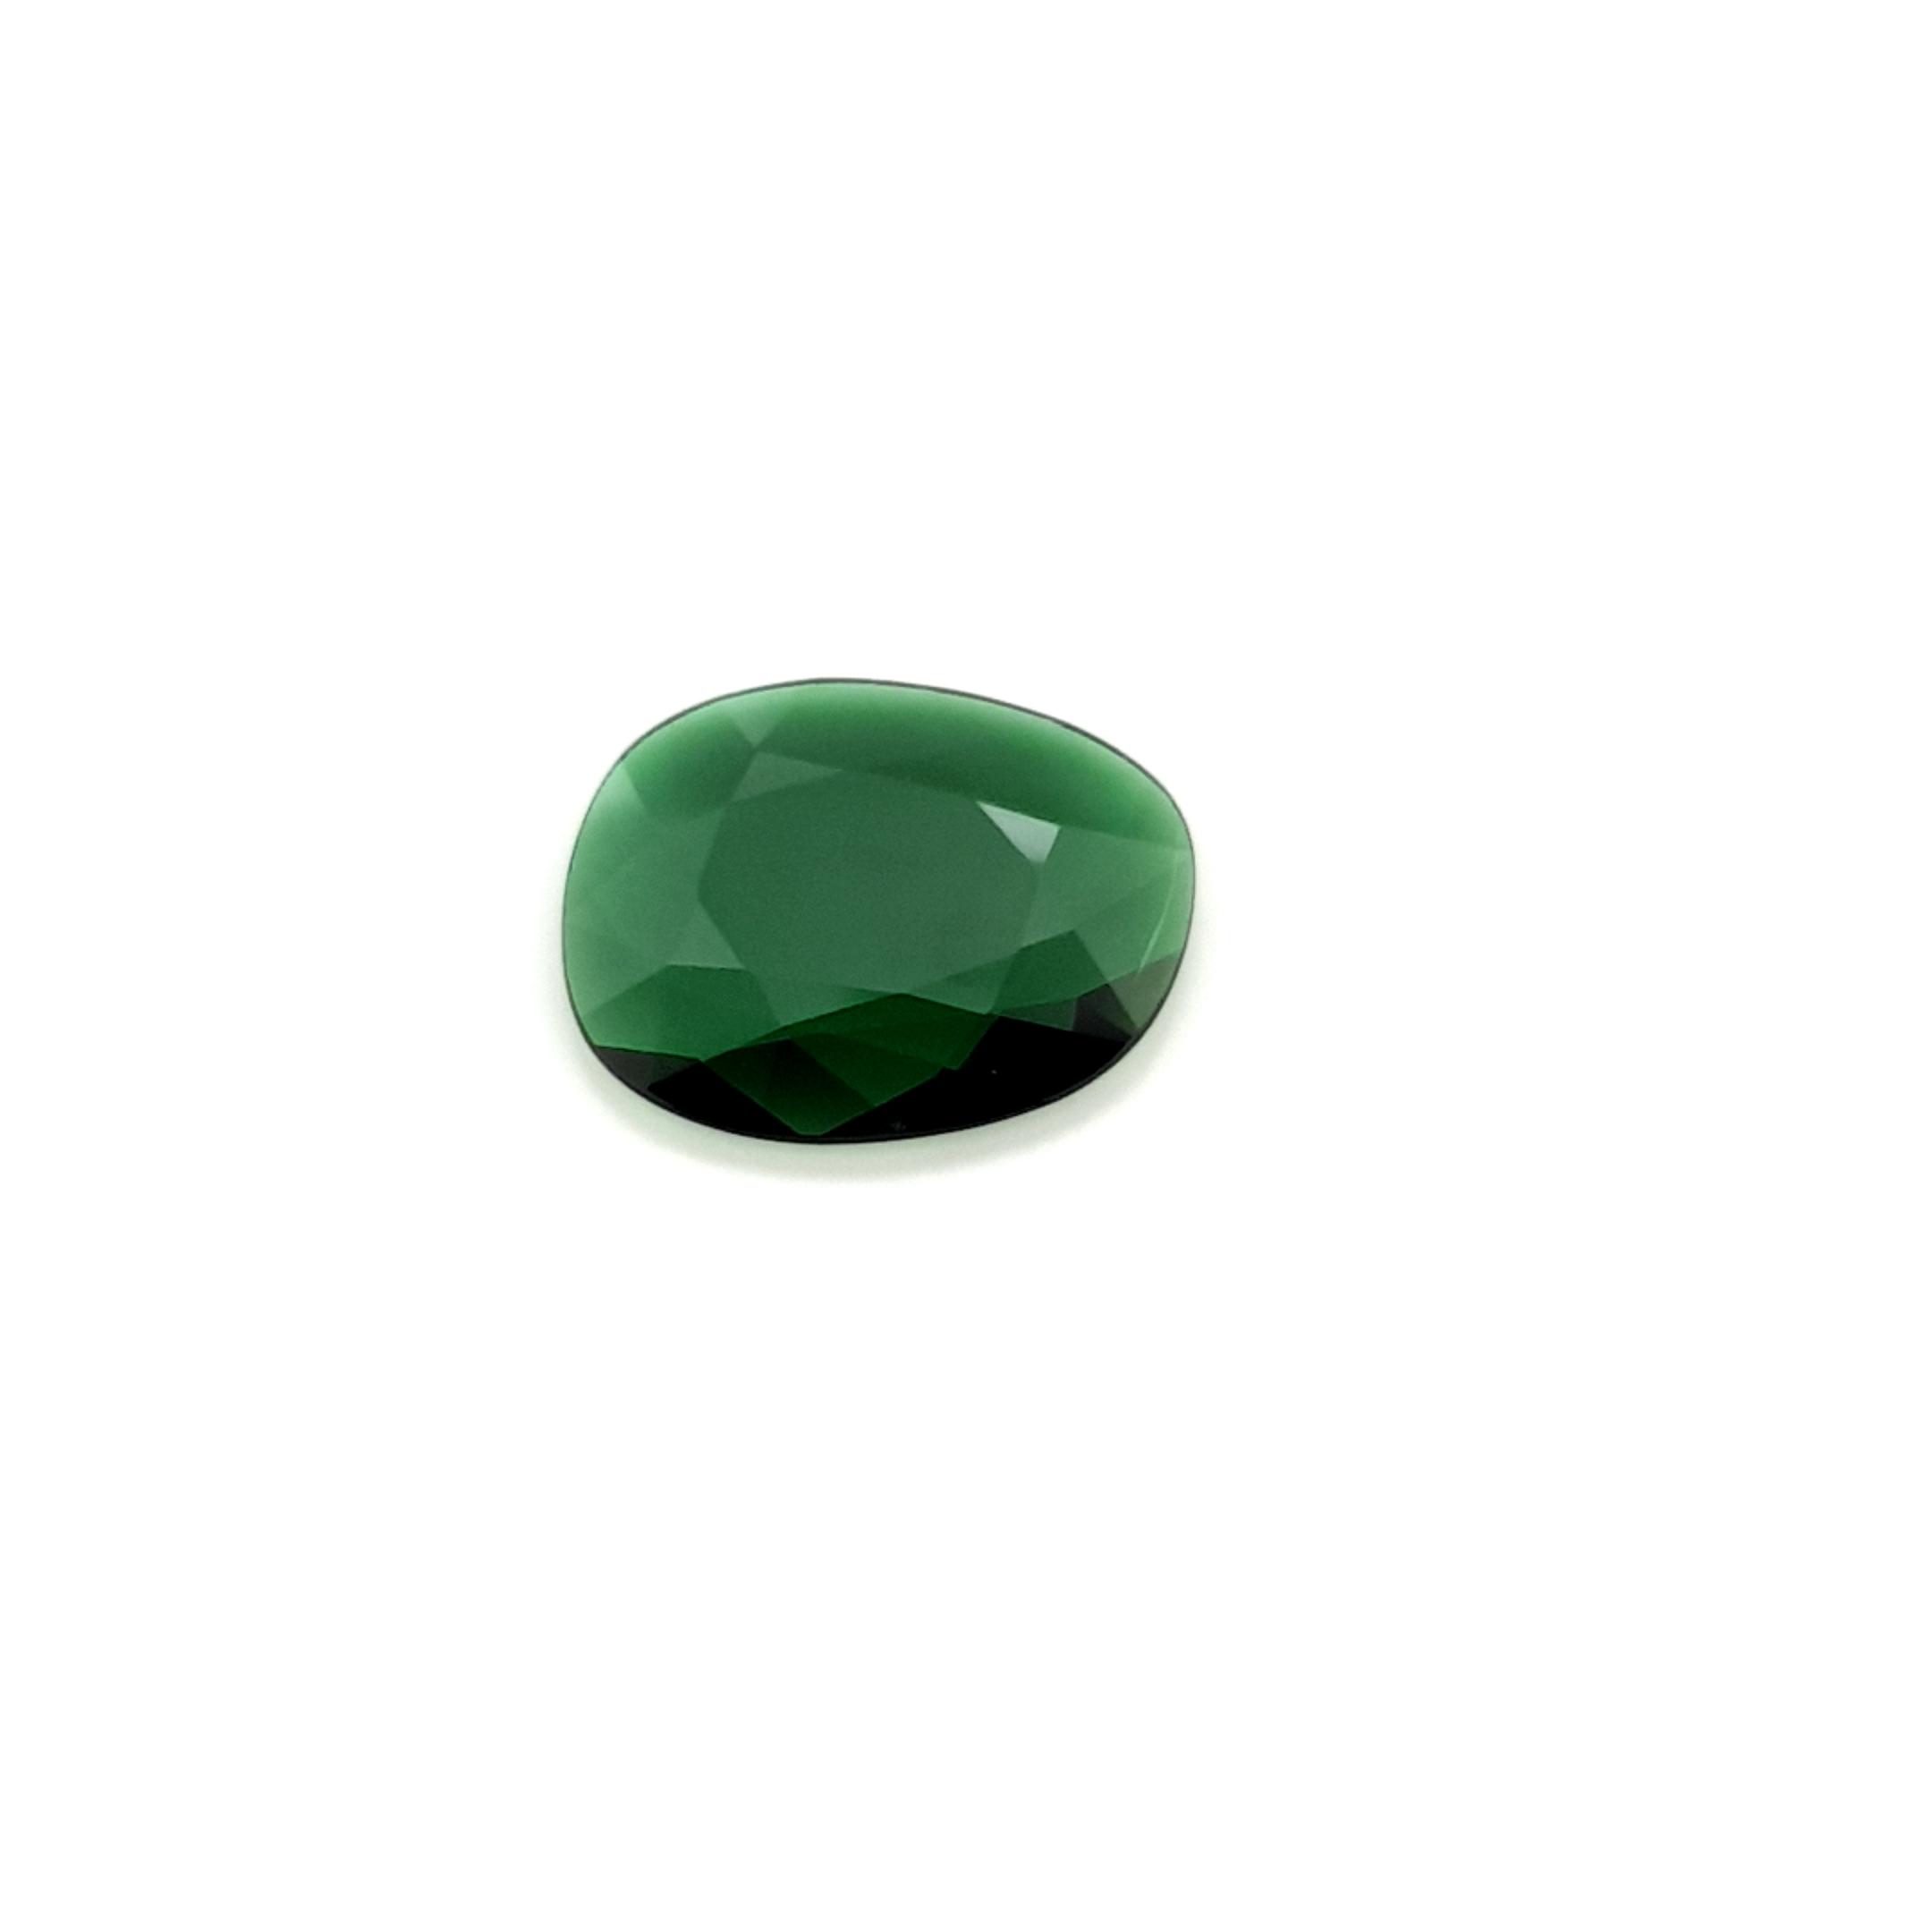 2,83ct. Imperial Green Tourmalin DoubleRoseCut TMK17C7 ClaudiaHamann__2021-02-11-16-14-36